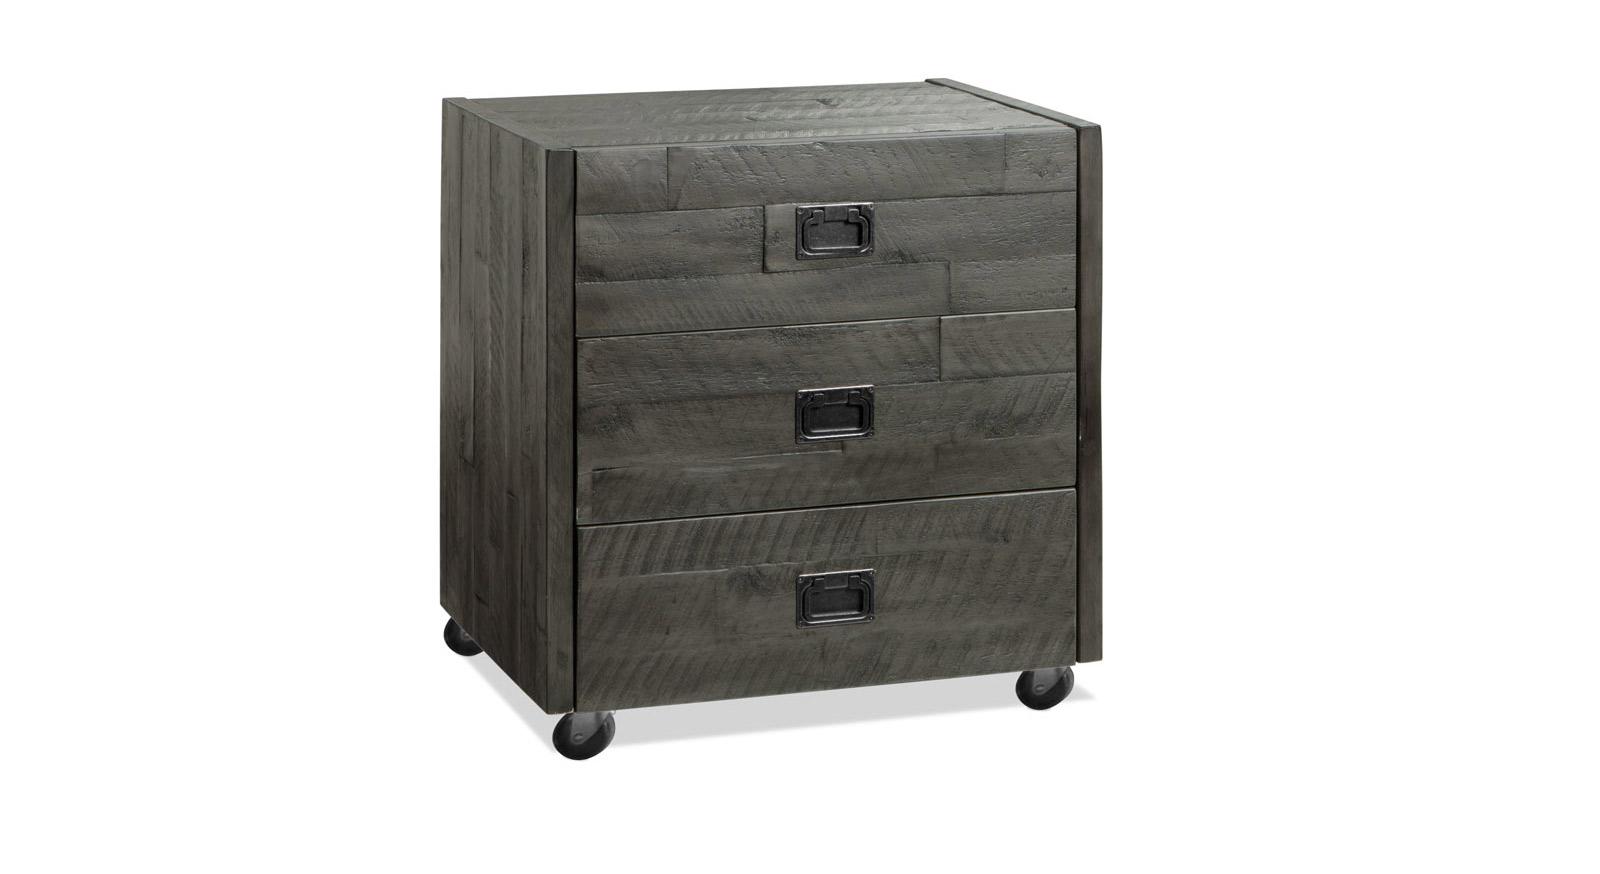 Rollcontainer Felipe aus grau lackiertem Massivholz